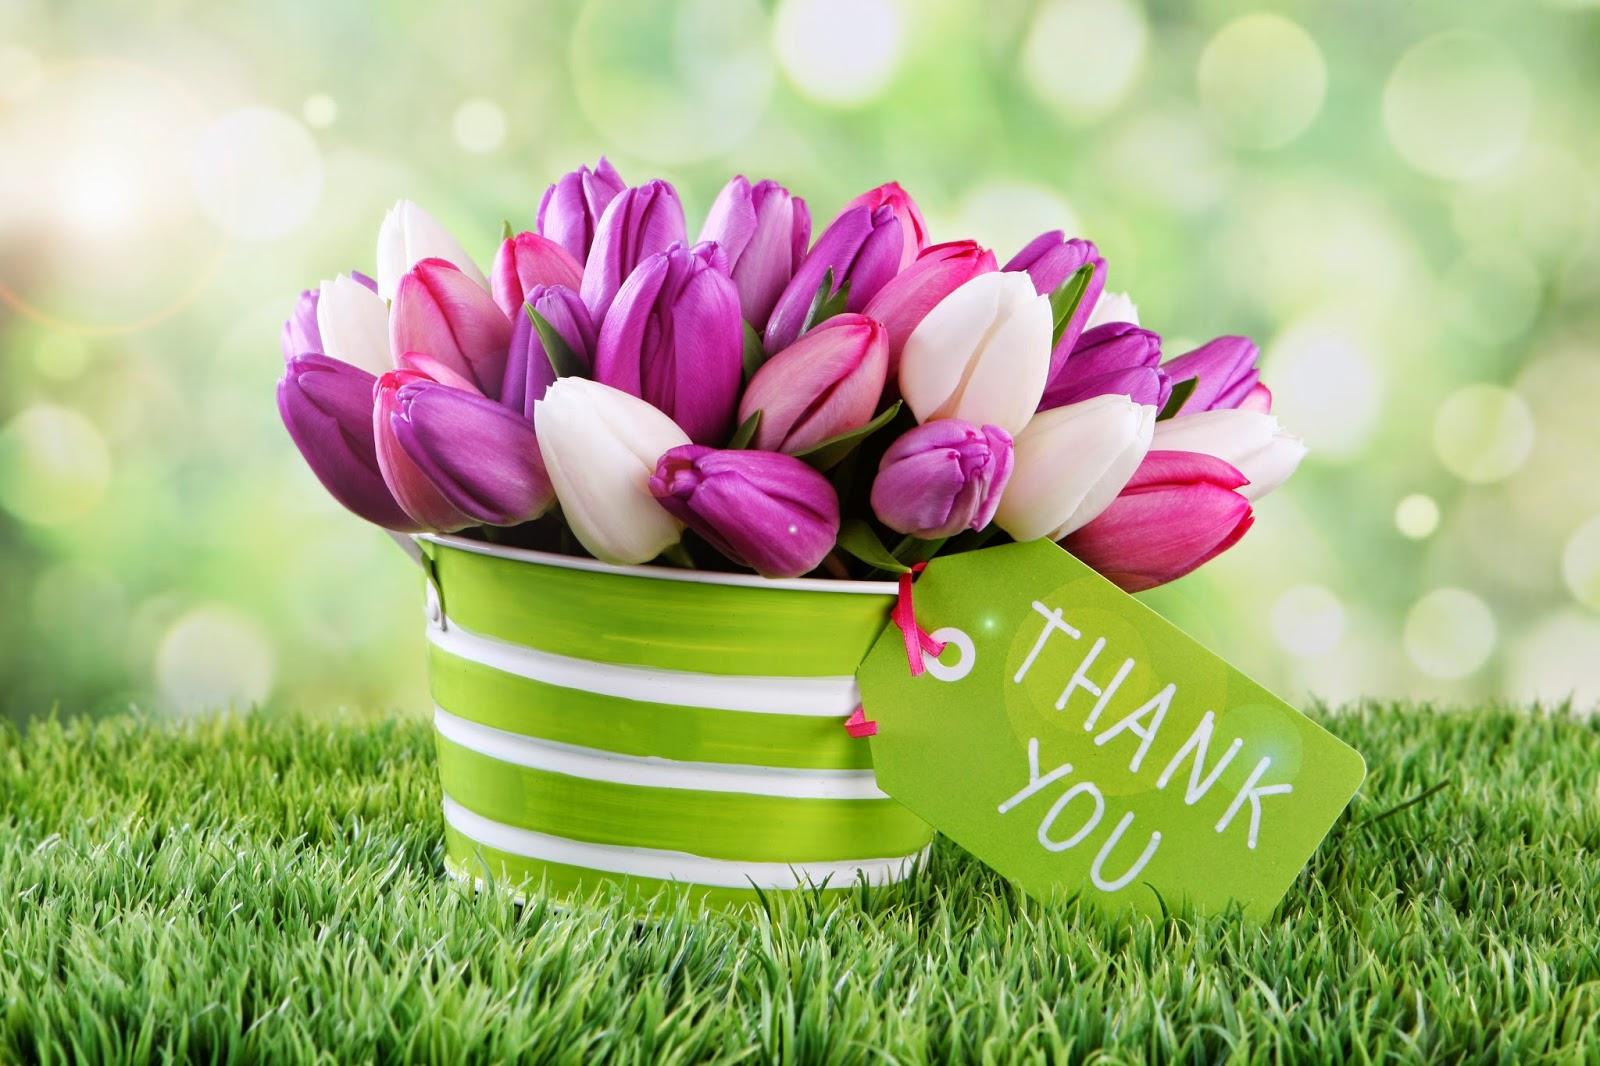 imagenes fotograficas: Imagenes bonitas de flores para ...